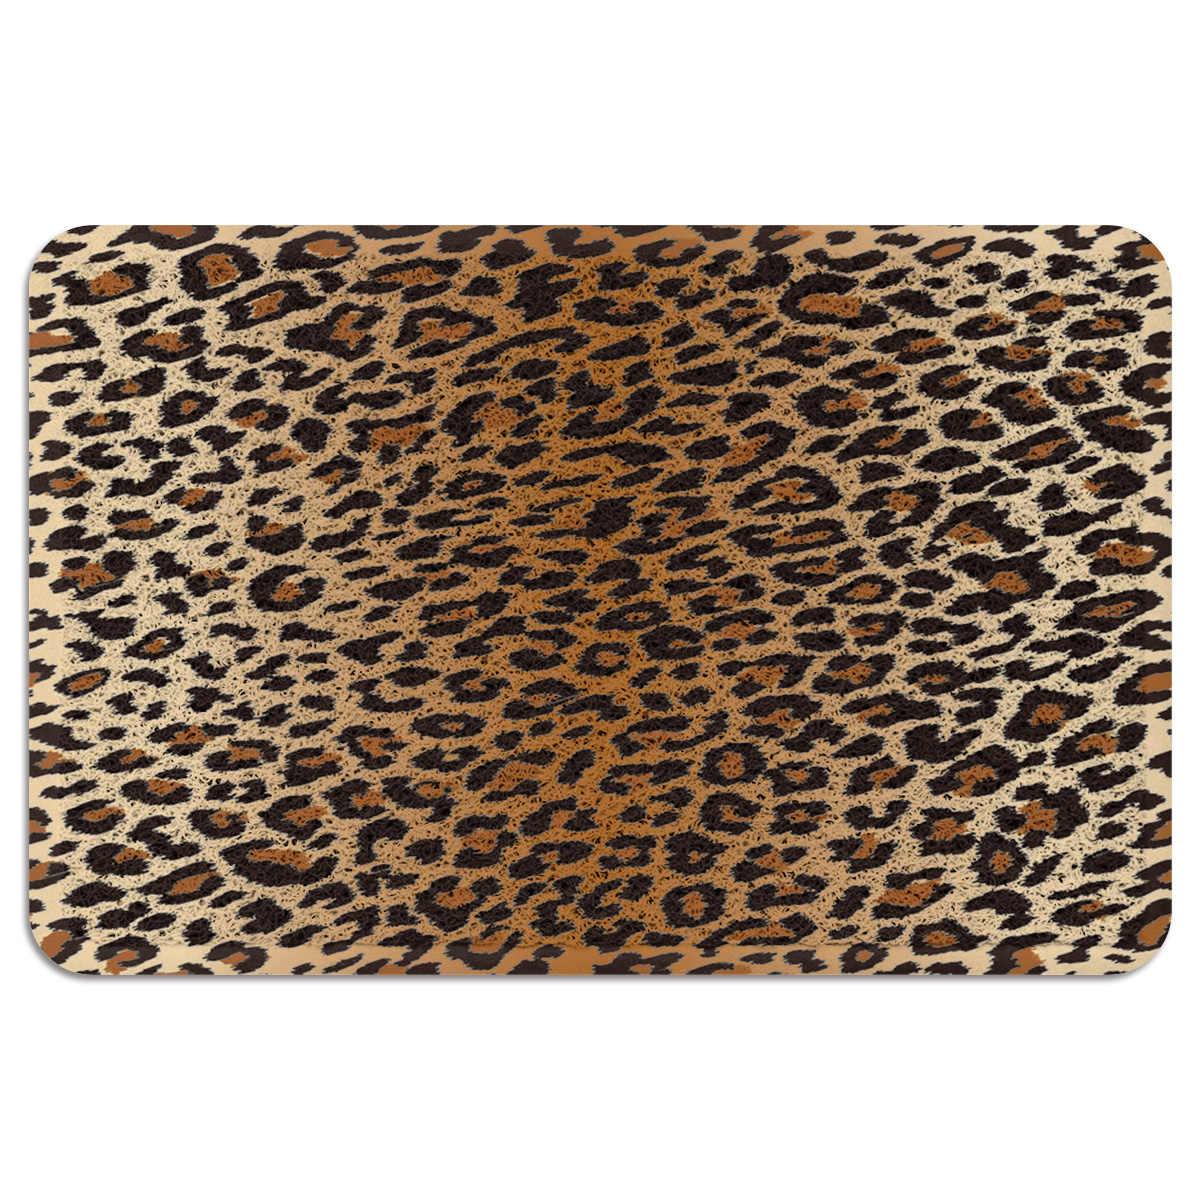 Leopard Outdoor Rugs For Patios Accent Rugs Door Mats Floor Mat Pvc Coil Area Rug Export Small Women Black Large Gray Men Man Mat Aliexpress